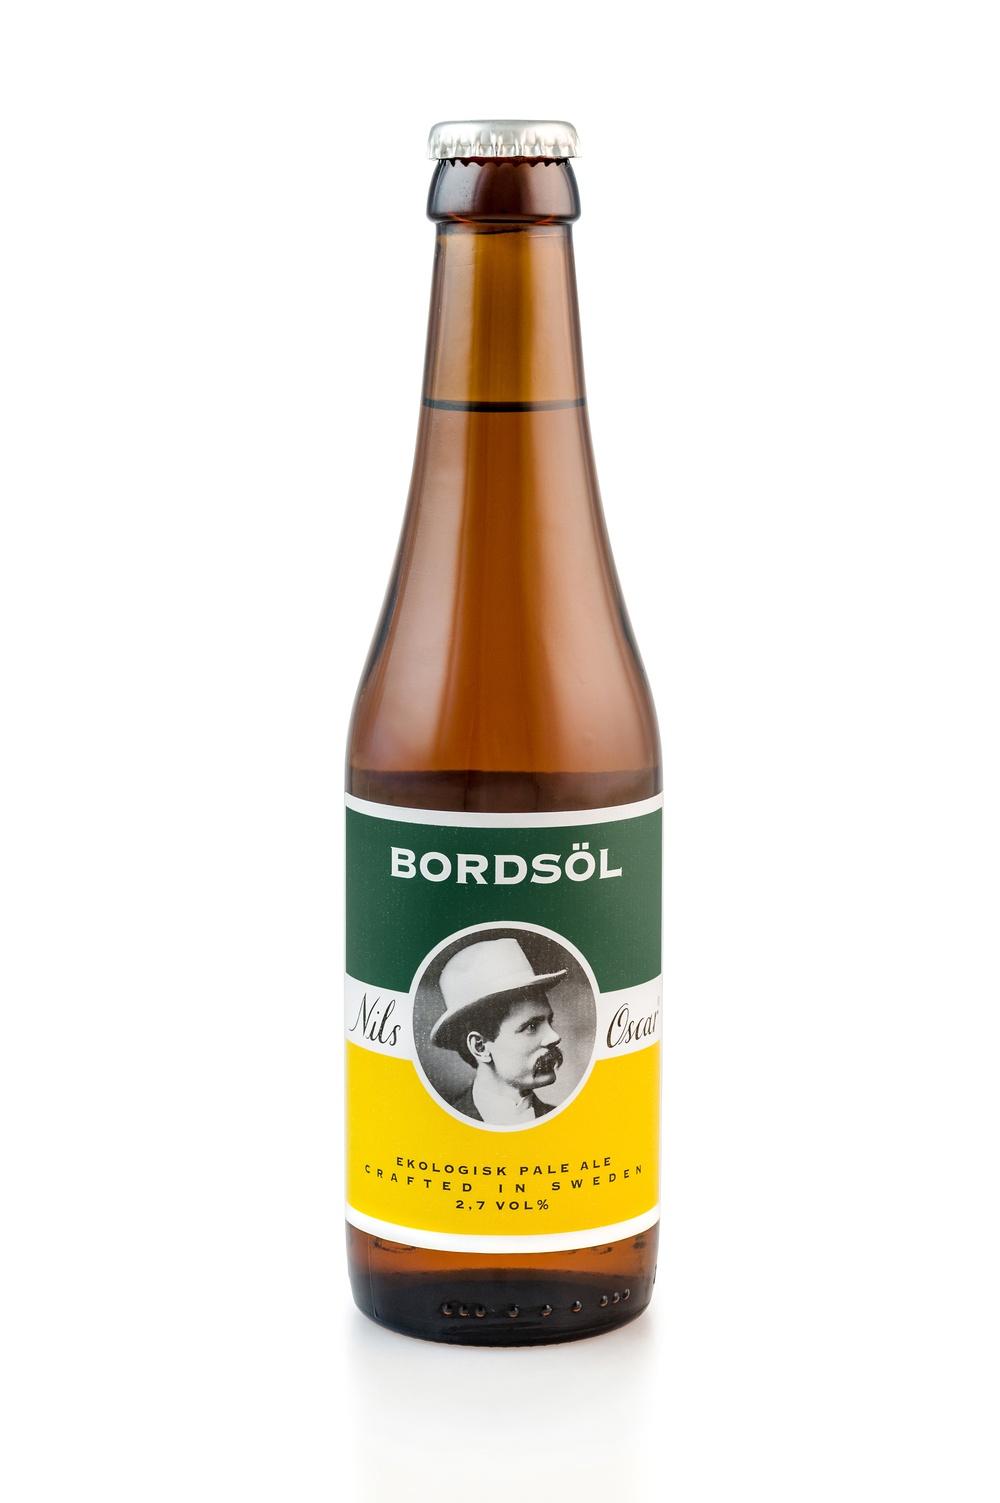 Nils Oscar Bordsöl